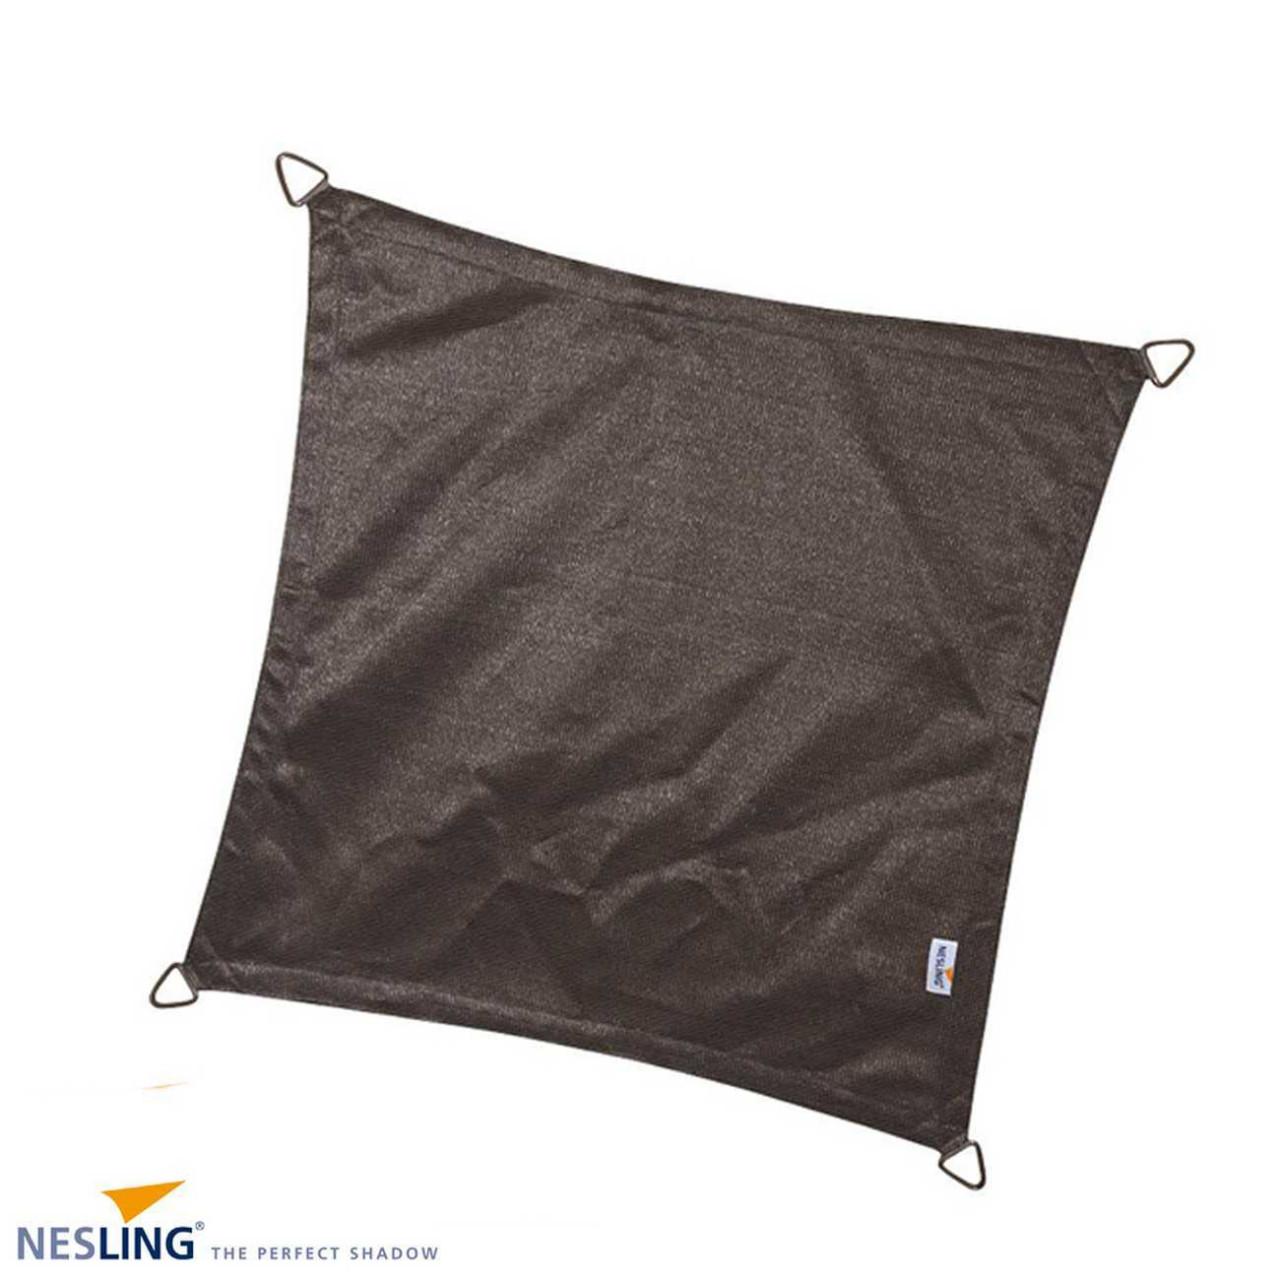 Sonnensegel von Nesling Quadrat 360 x 360 cm